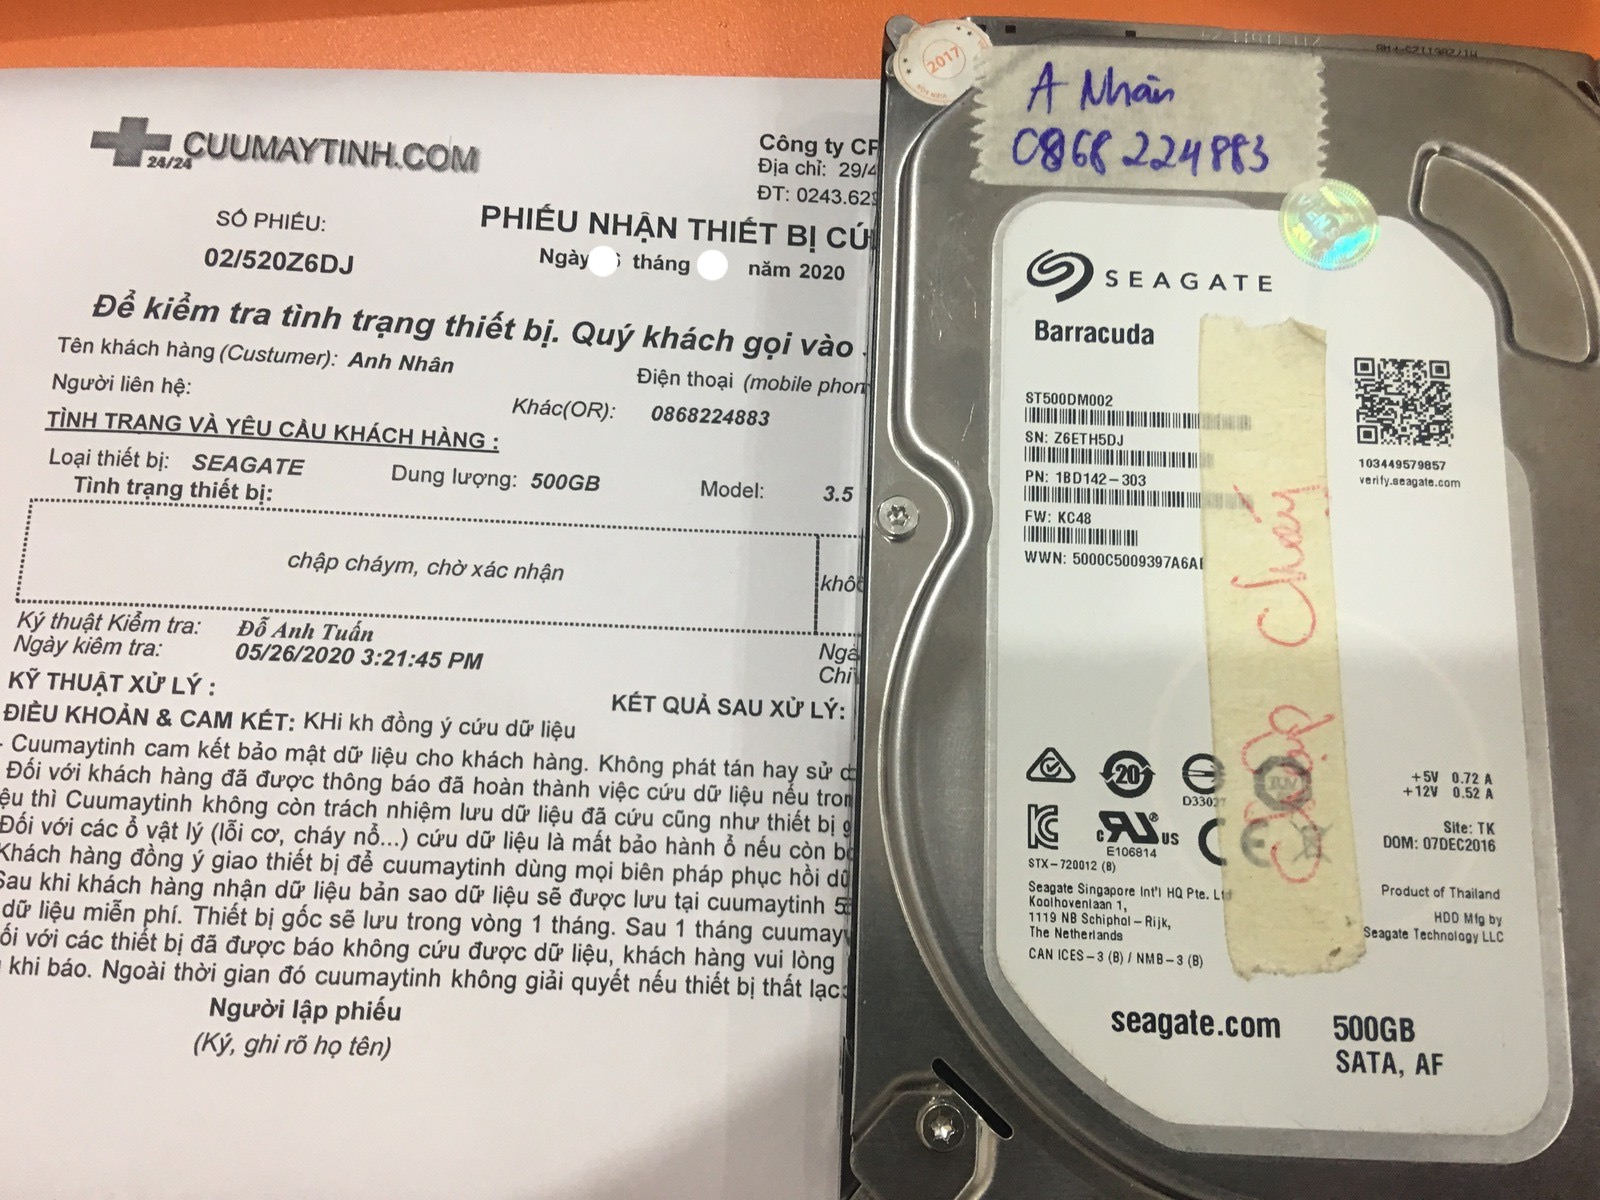 Cứu dữ liệu ổ cứng Seagate 500GB lỗi đầu đọc 02/06/2020 - cuumaytinh